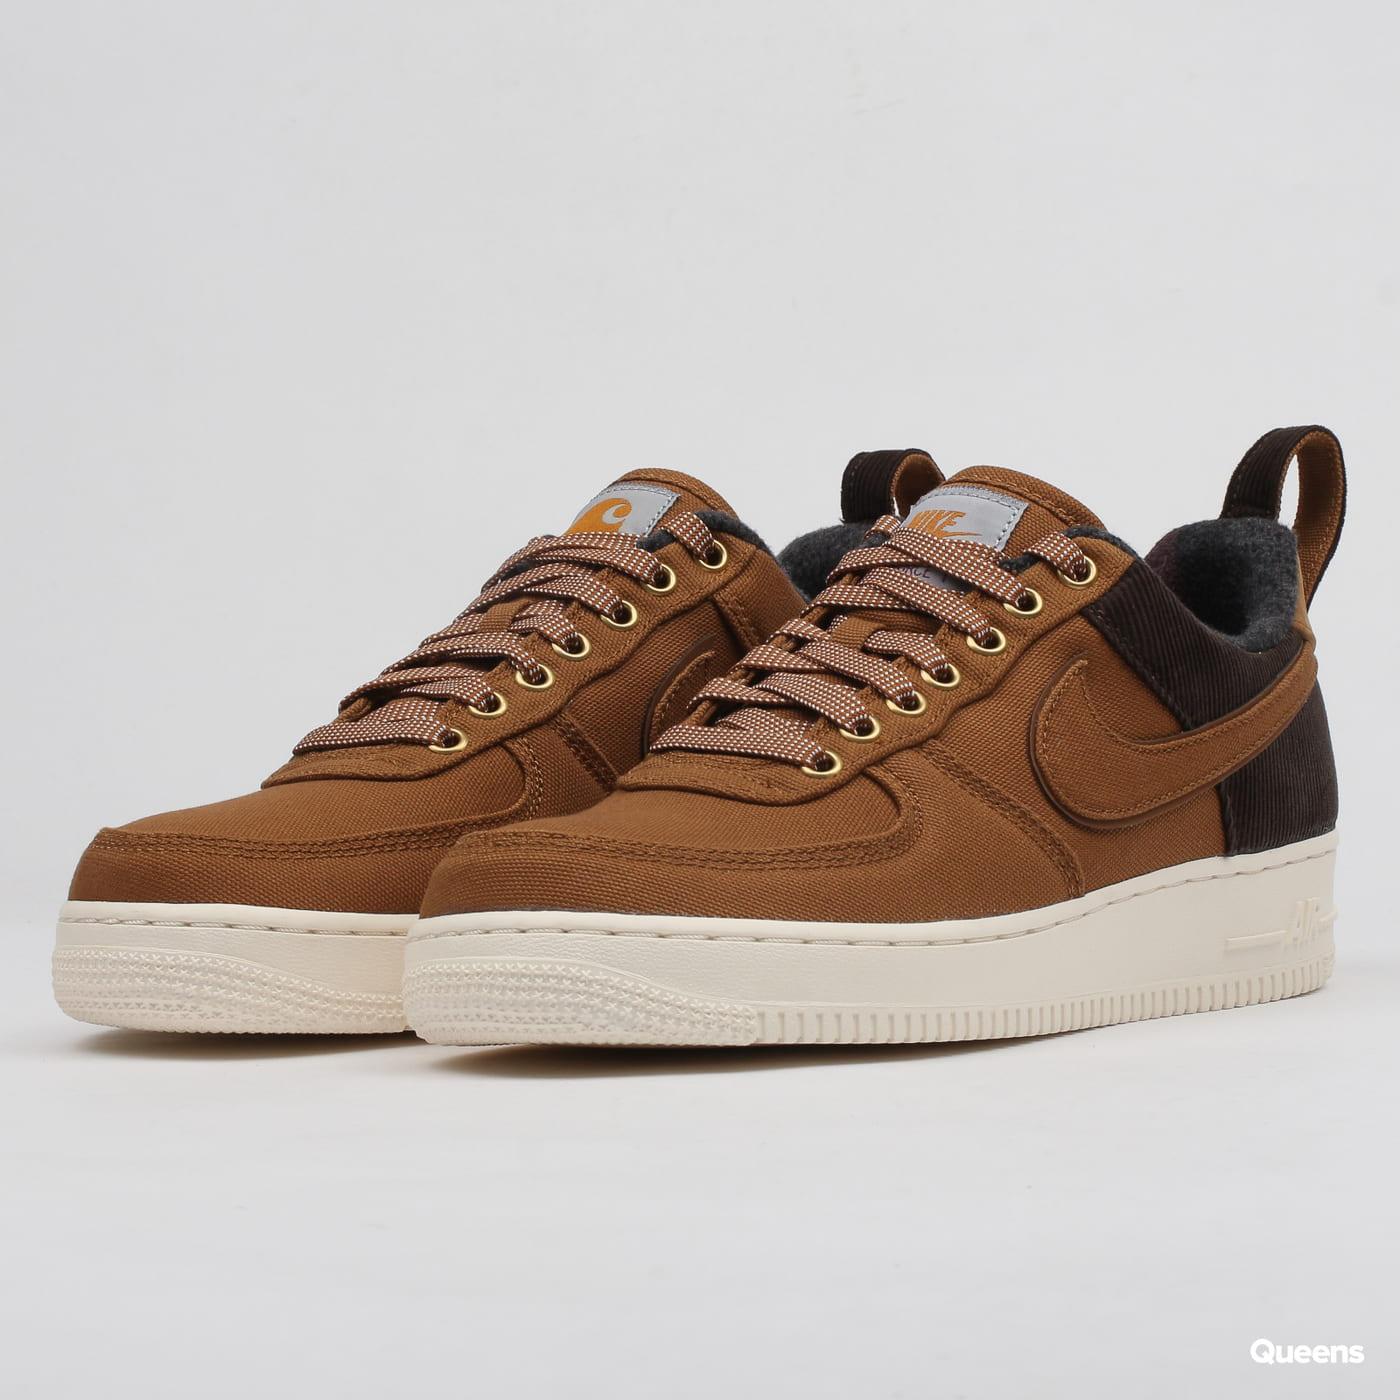 buy popular 2364f 1edd0 Nike Carhartt x Nike Air Force 1 ale brown / ale brown - sail